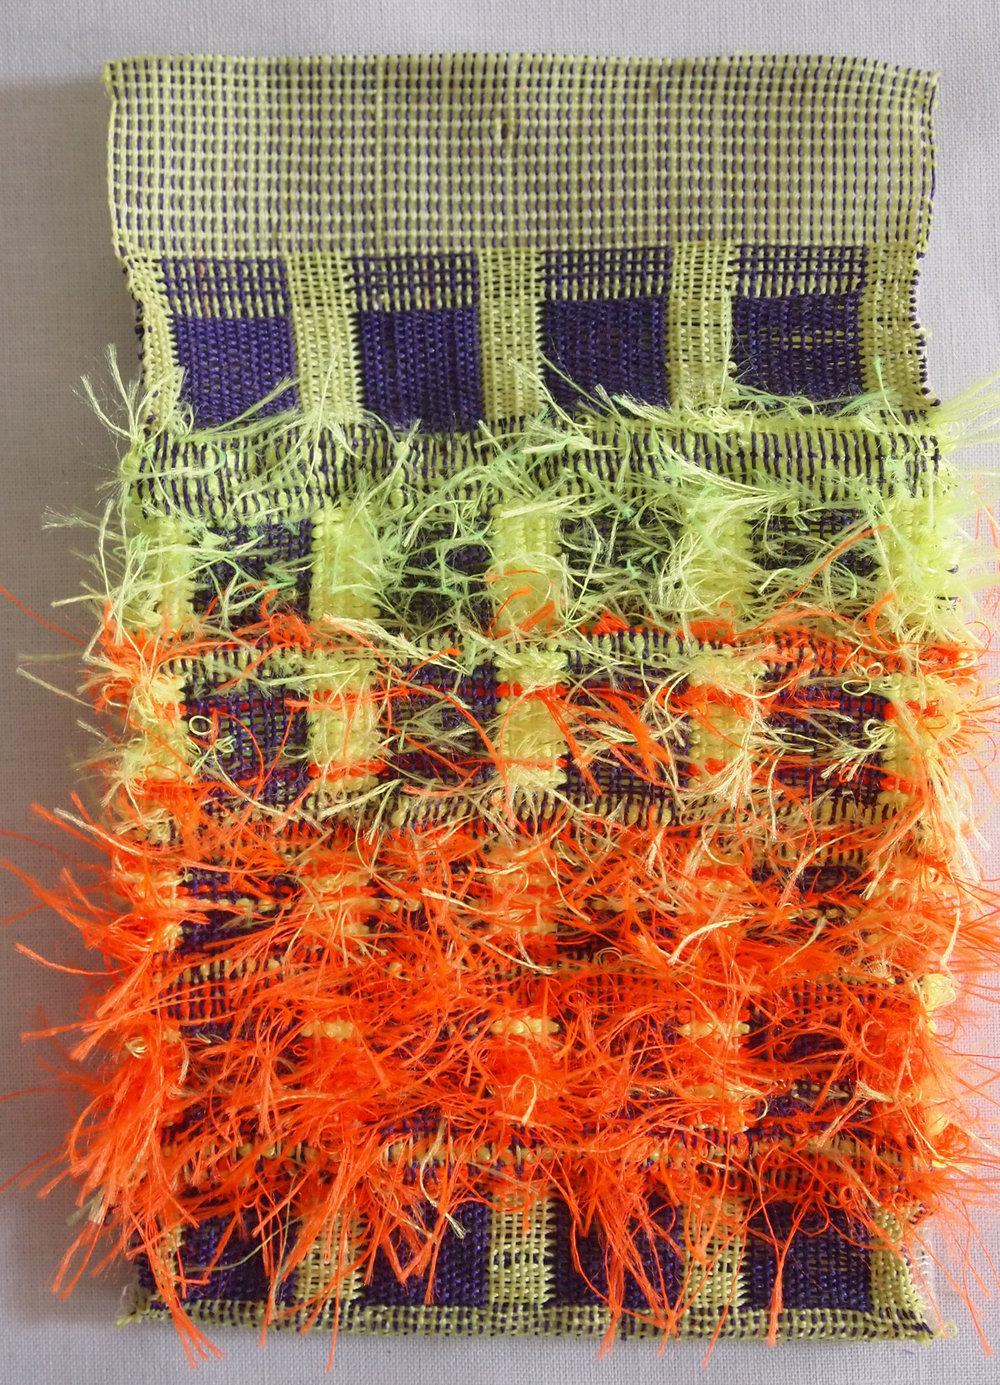 Hand Woven  Nylon thread, Acrylic, Monofilament, Glow-in-the-dark Plastic Cord